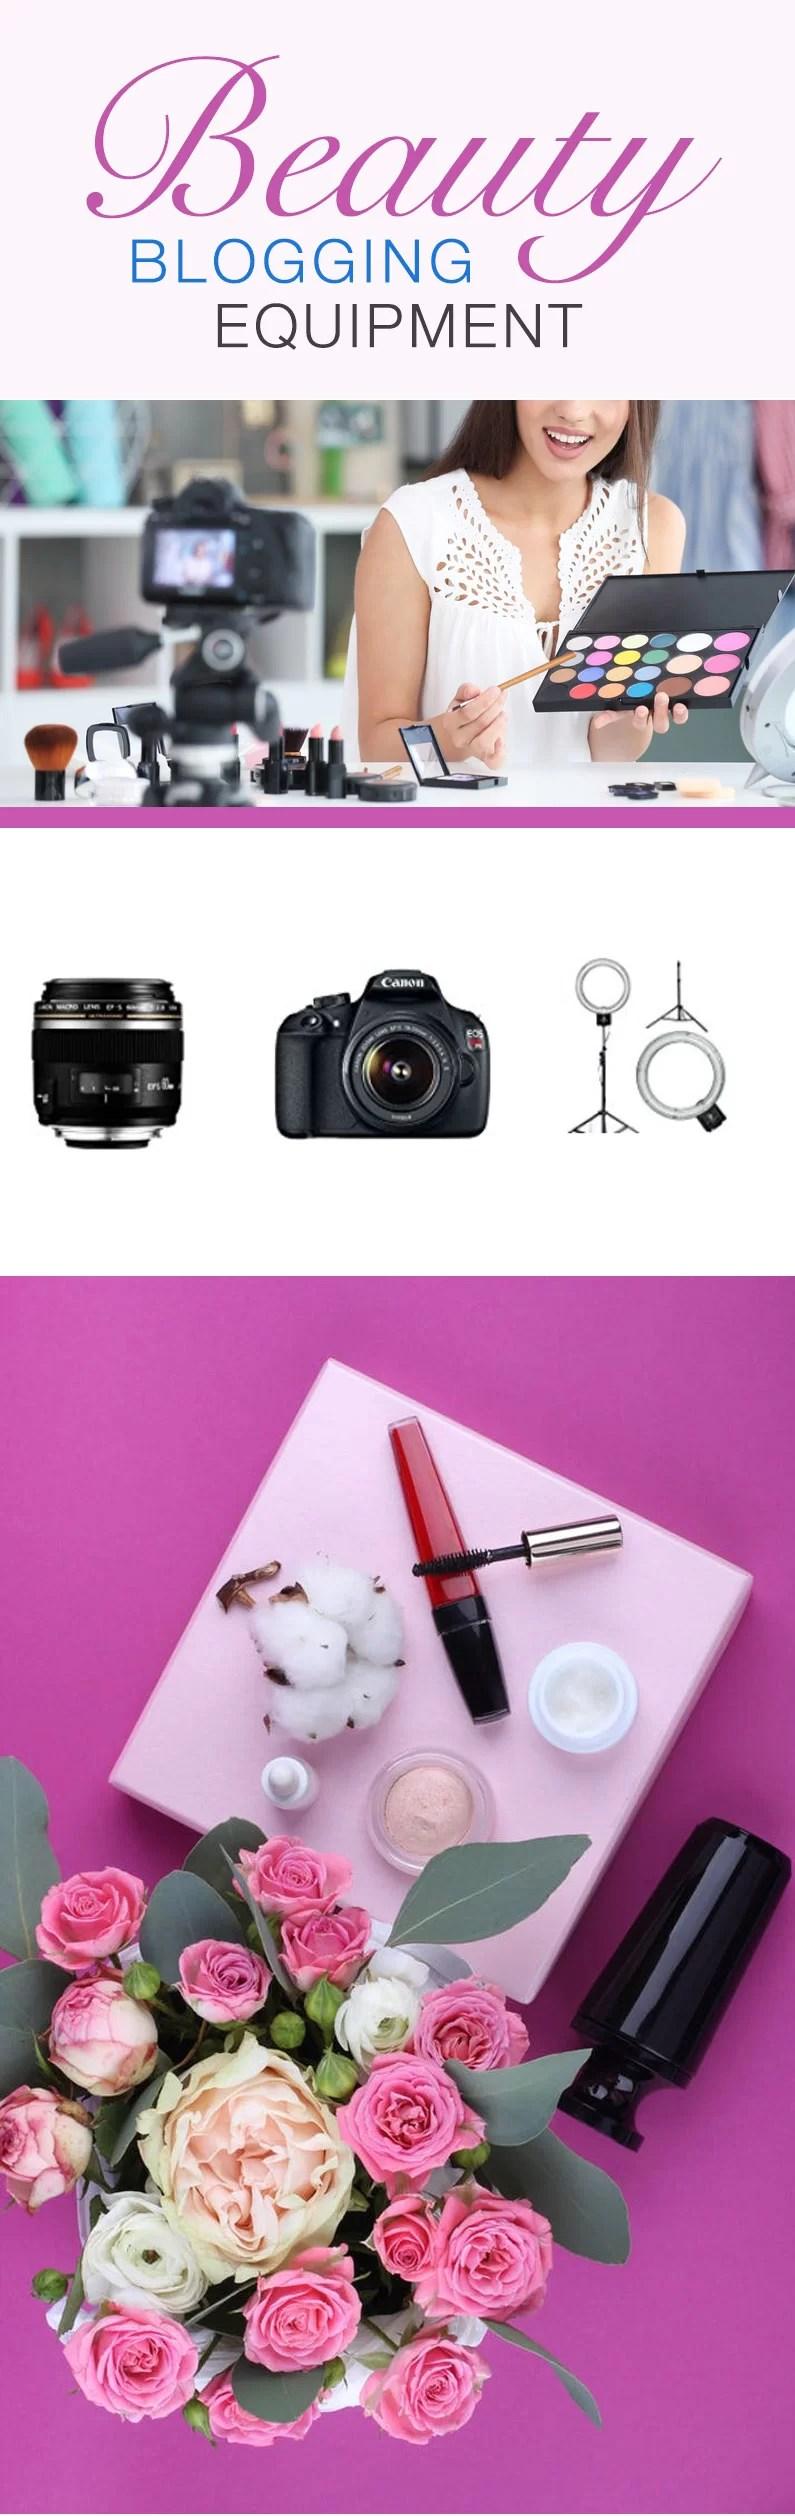 beauty blogging equipment